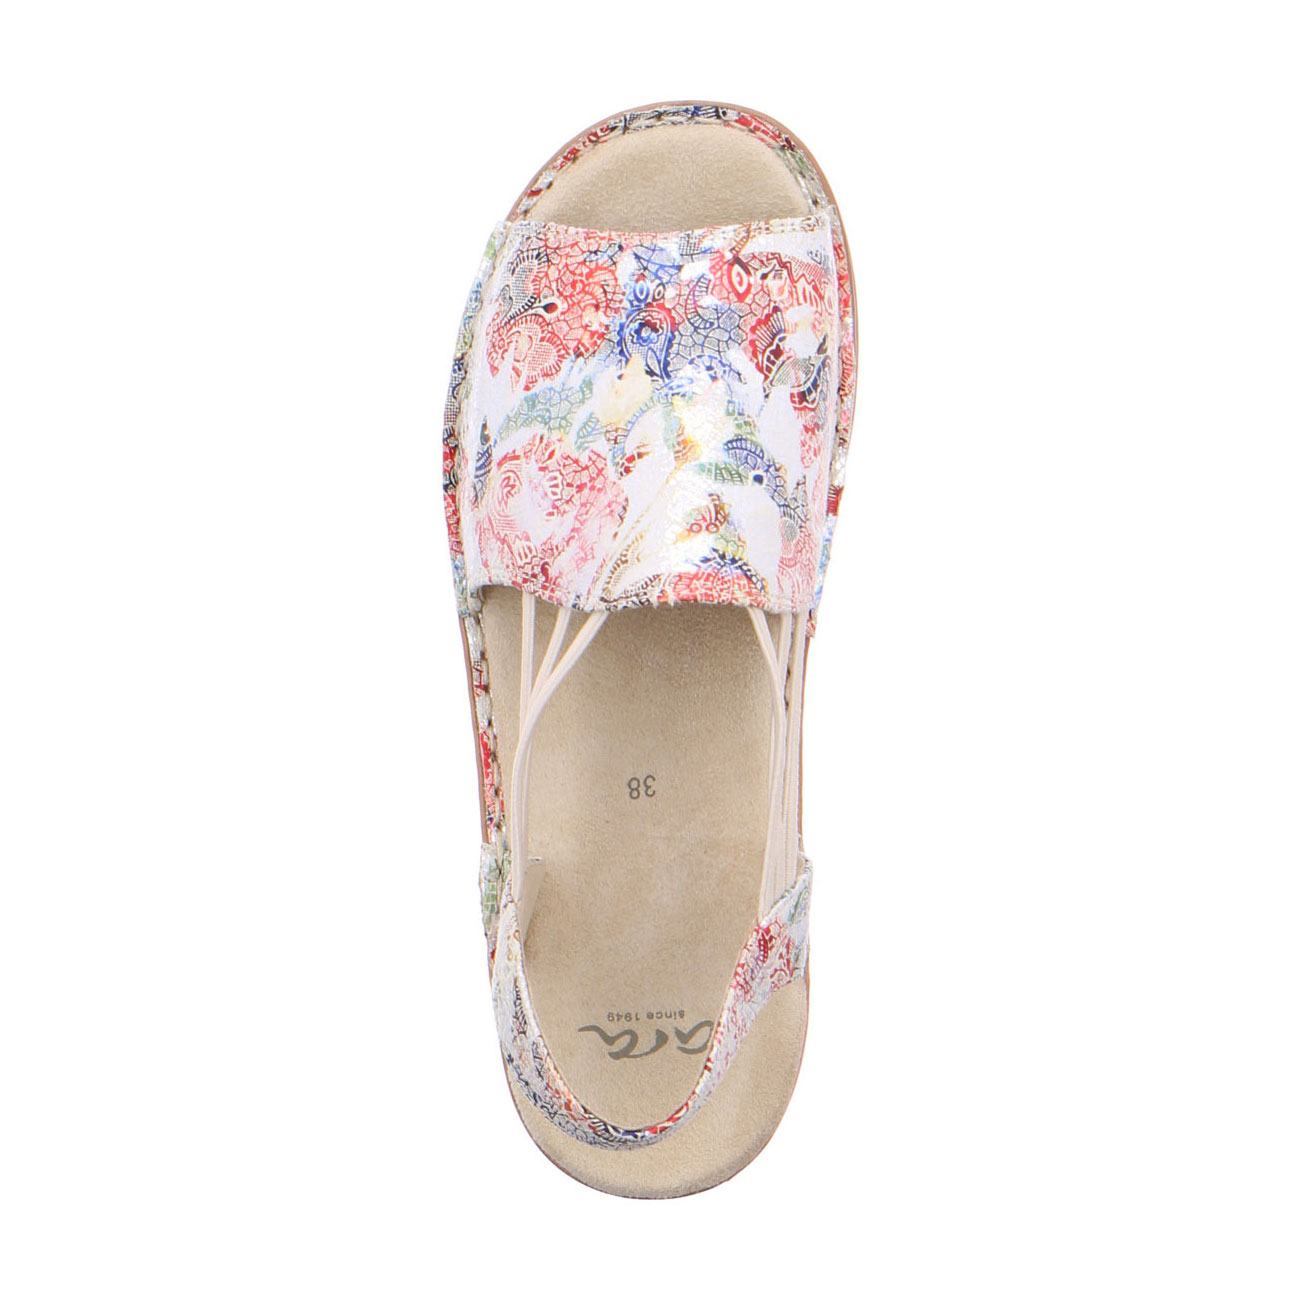 Дамски сандали с ластици Ara Hawaii multi 12-27241-73 шарени - снимка 5